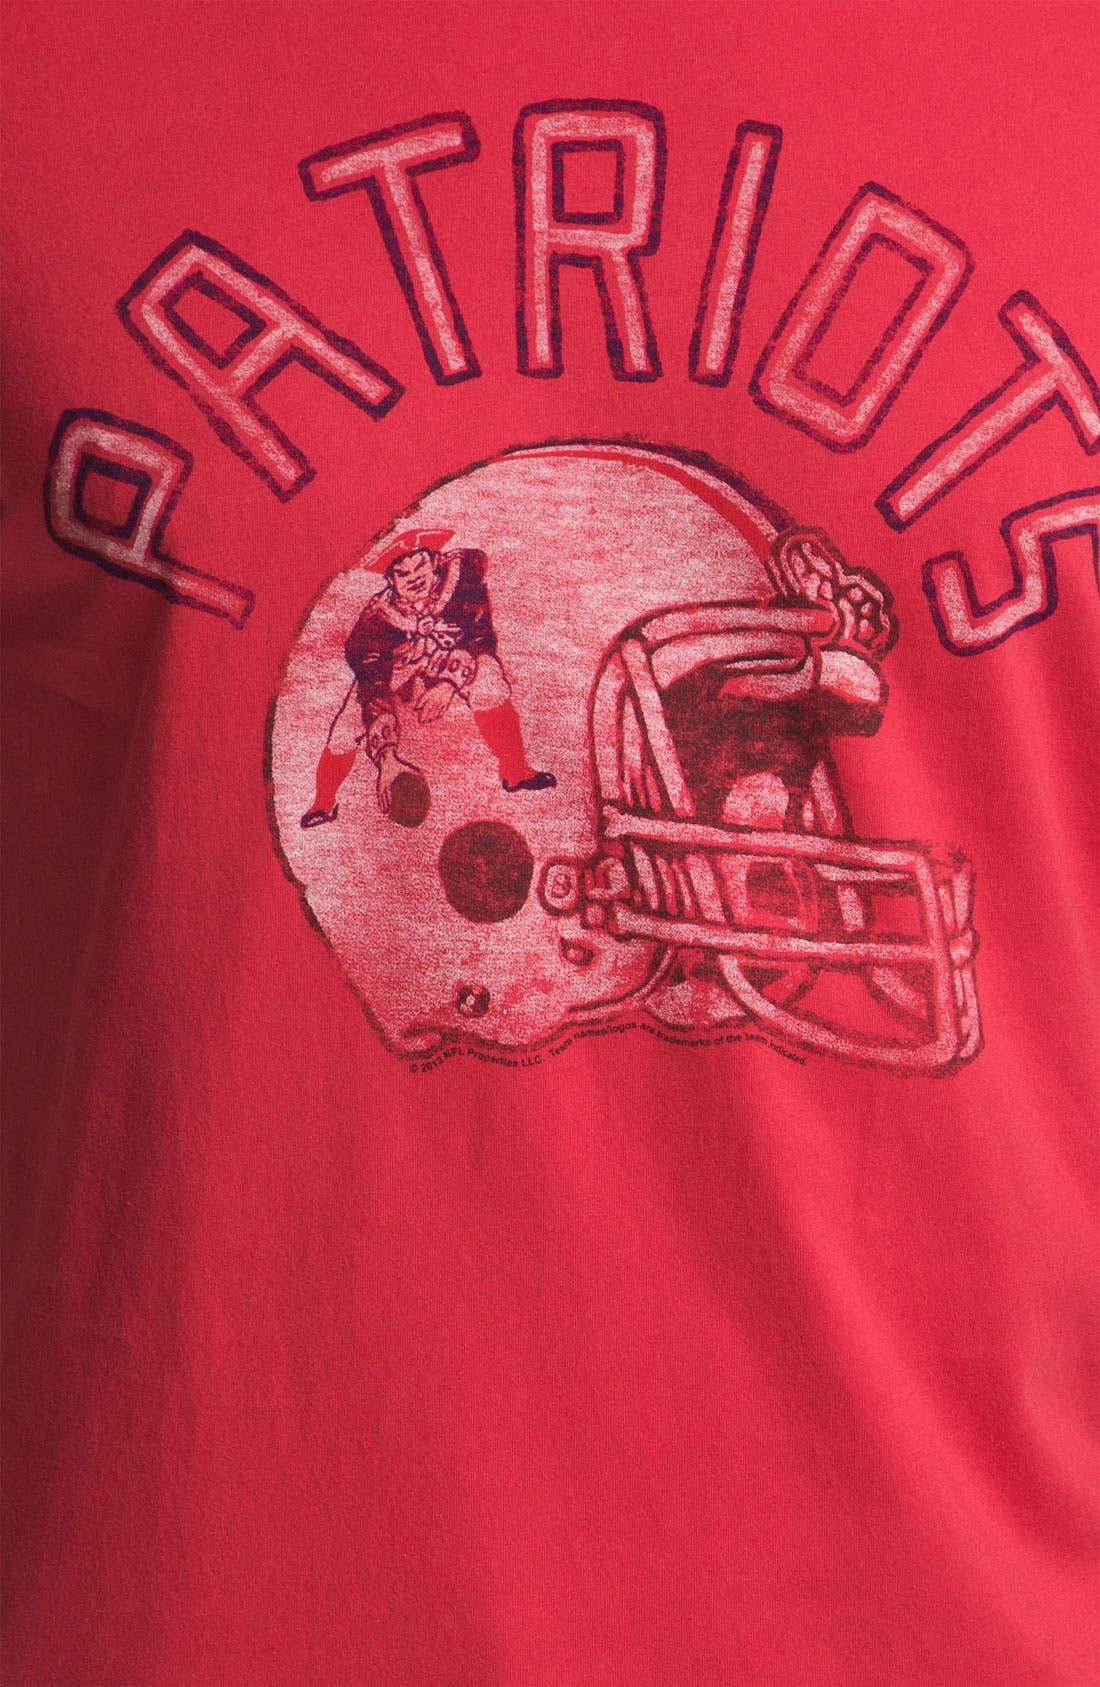 'New England Patriots' T-Shirt,                             Alternate thumbnail 2, color,                             621